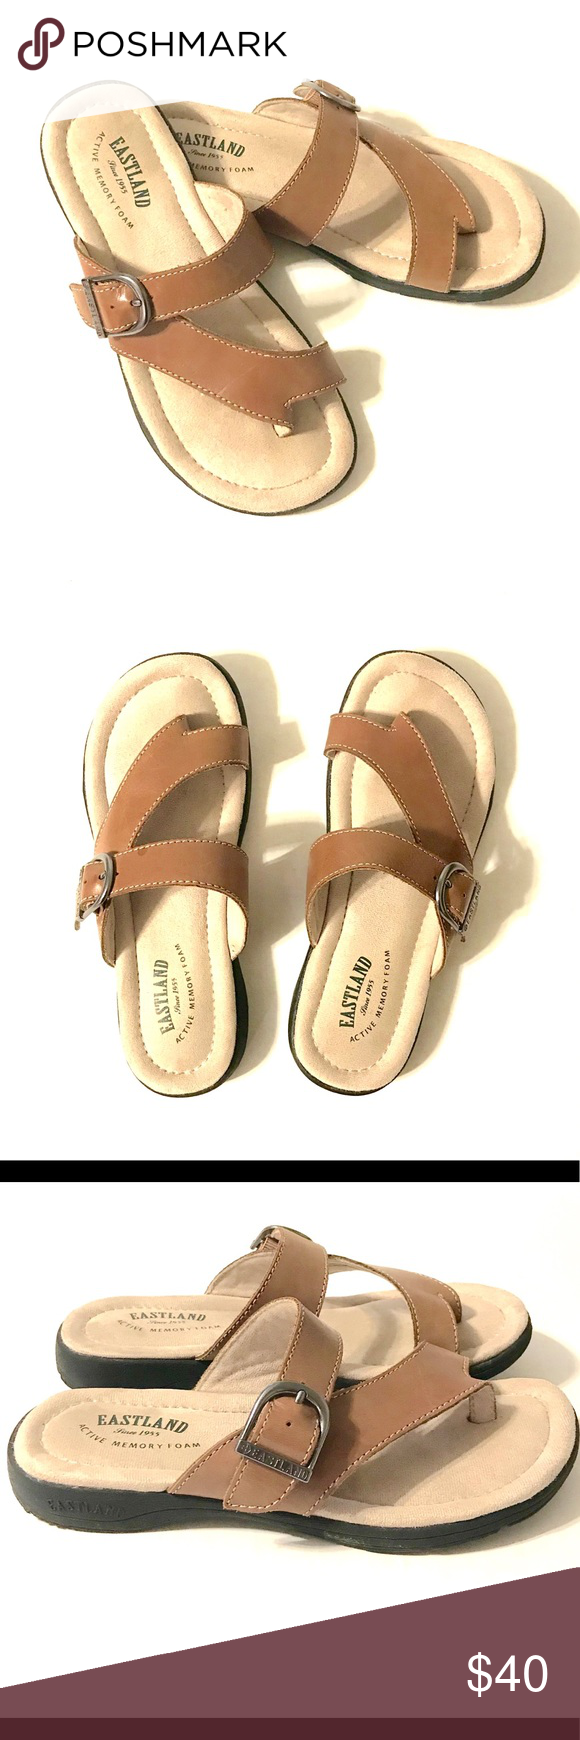 3489cdeef3d4 Eastland TAHITI II • Womens Brown Thong Sandals 7W Eastland TAHITI II •  Womens Brown Thong